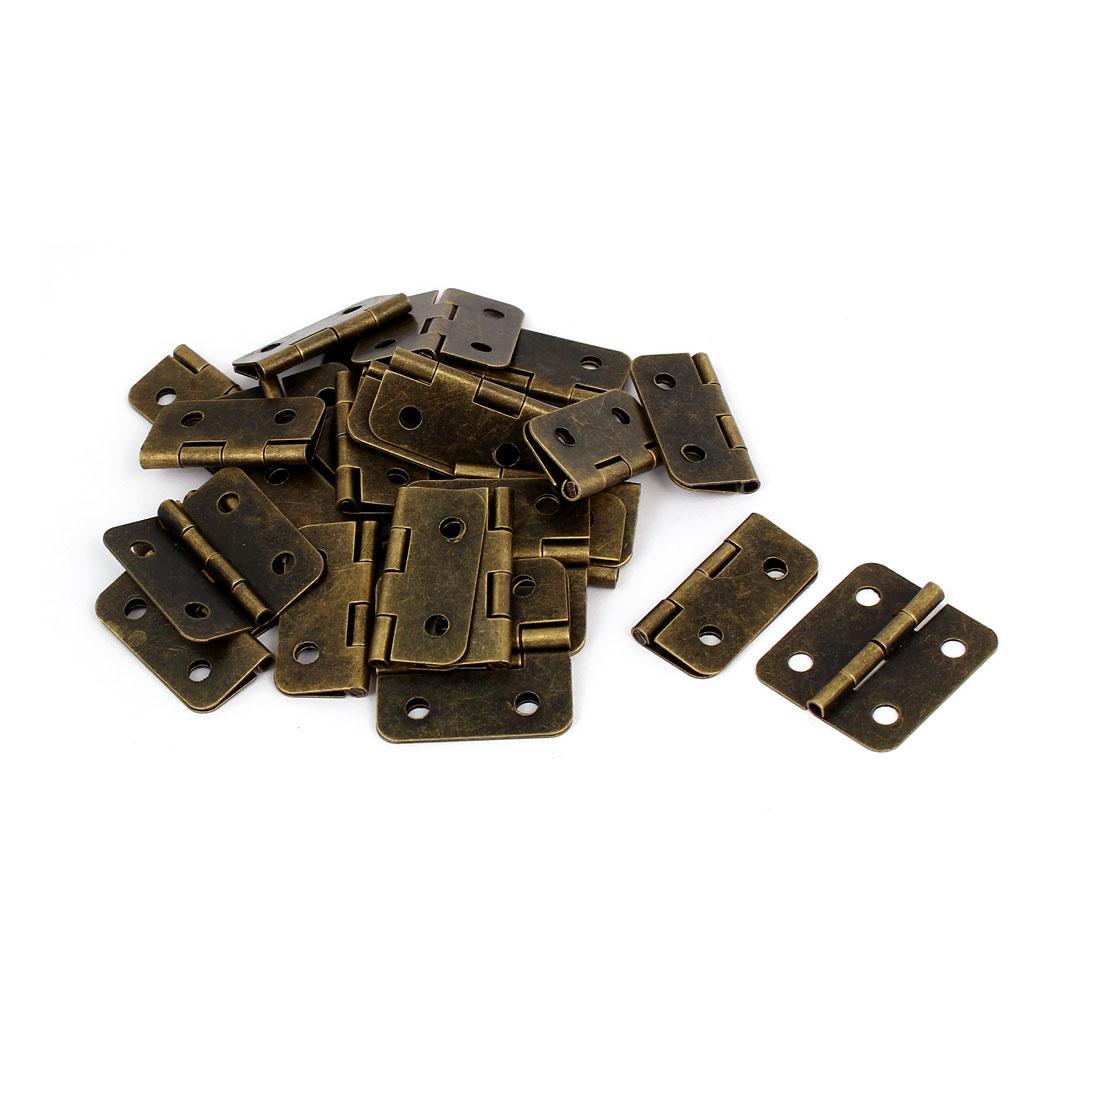 "Wooden Case Cabinet Metal Foldable Butt Hinges Bronze Tone 1.2"" Length 30PCS"